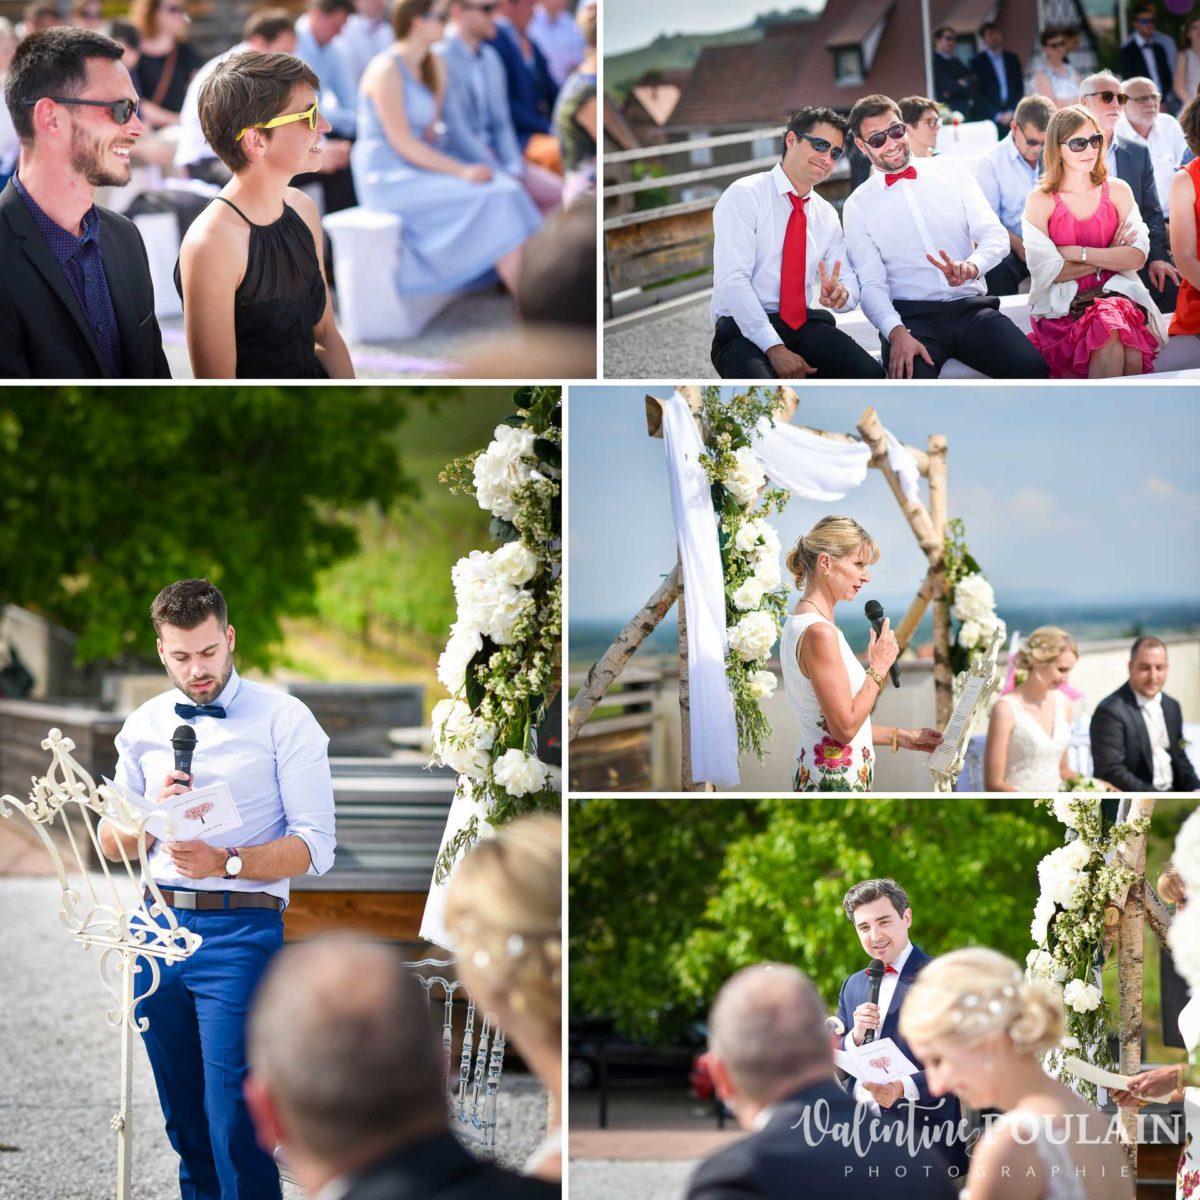 Mariage wedding planner - Valentine Poulain cérémonie